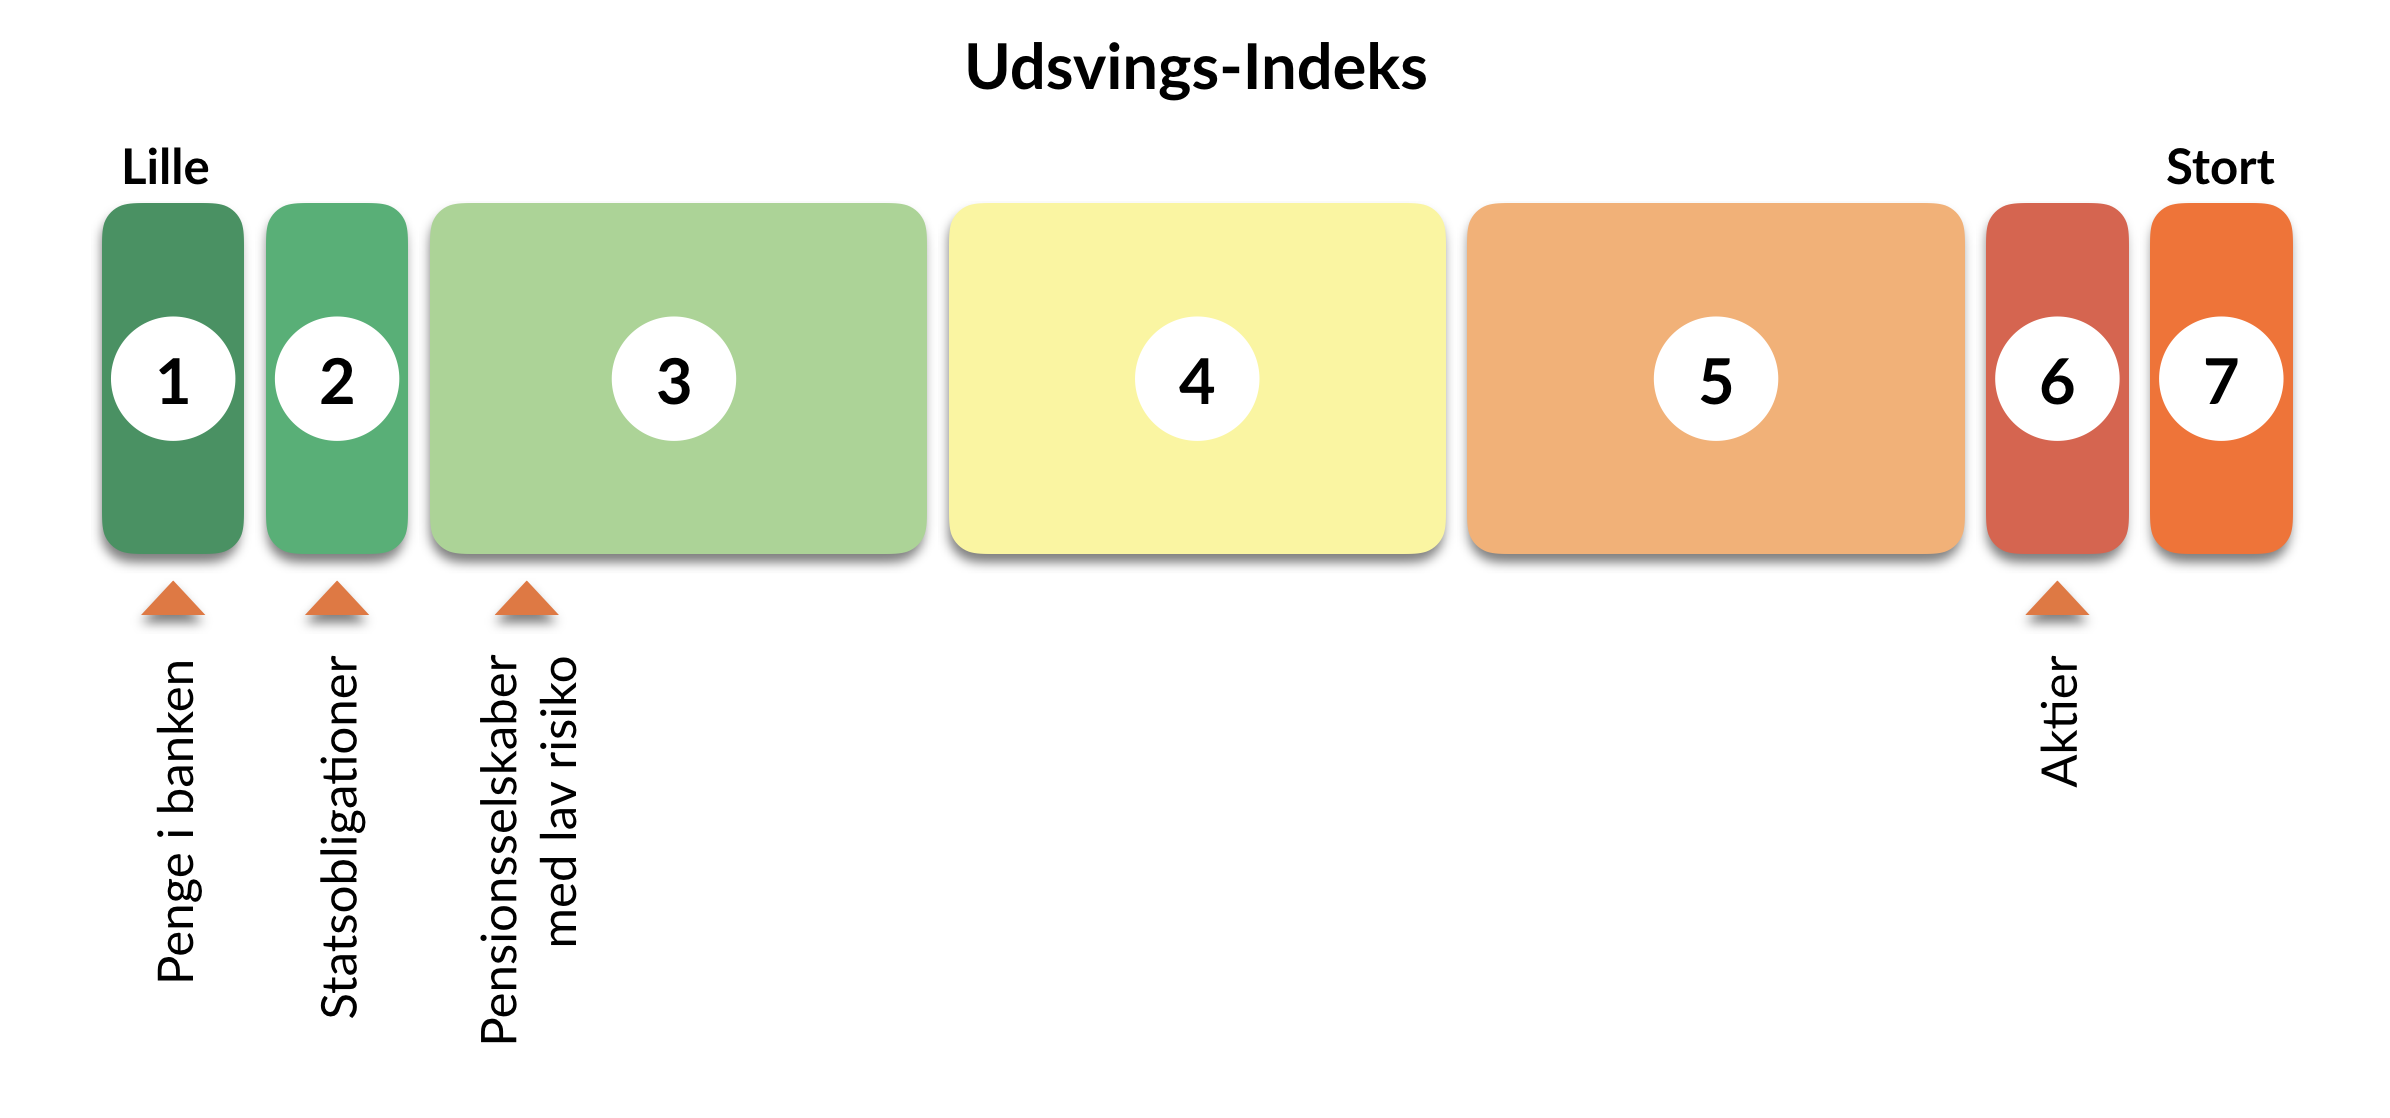 Macintosh HD:Users:frederikmuller:Desktop:Udsvingsindex.png